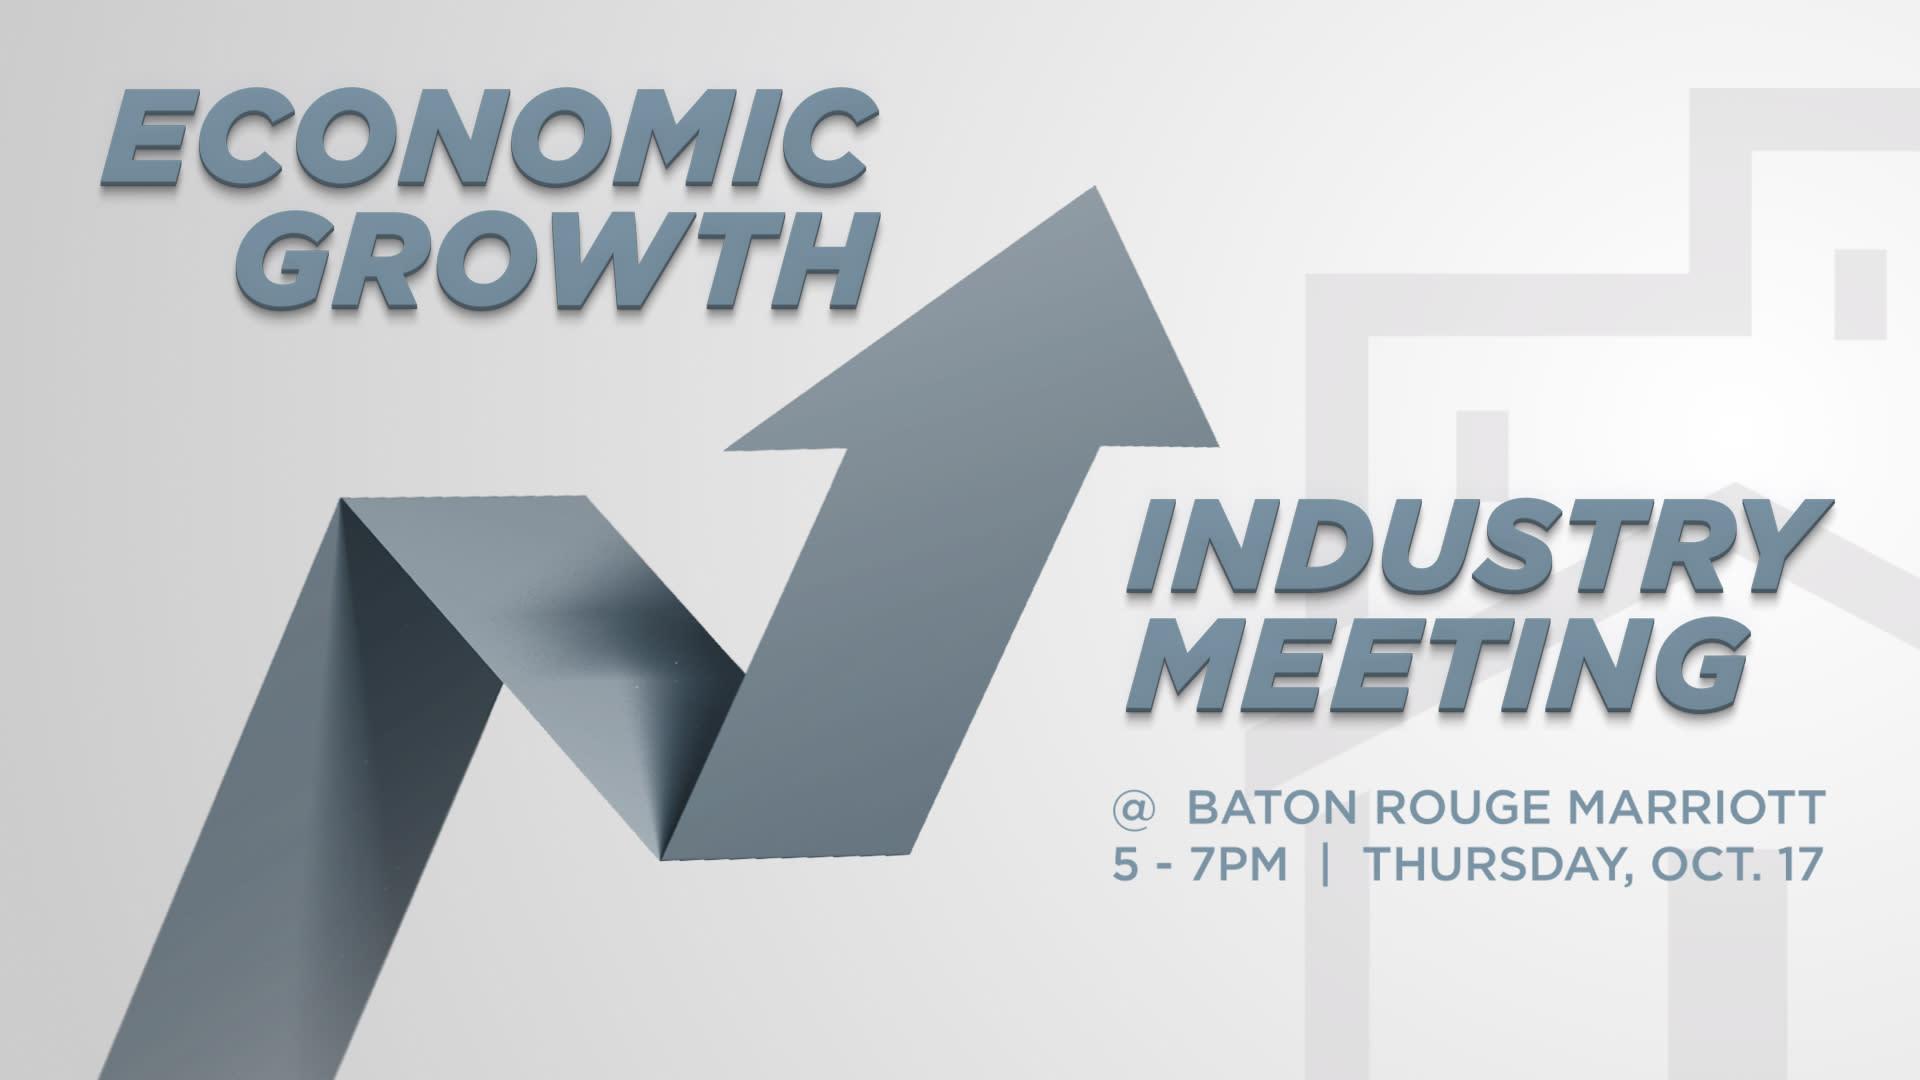 Industry Meeting: Economic Growth